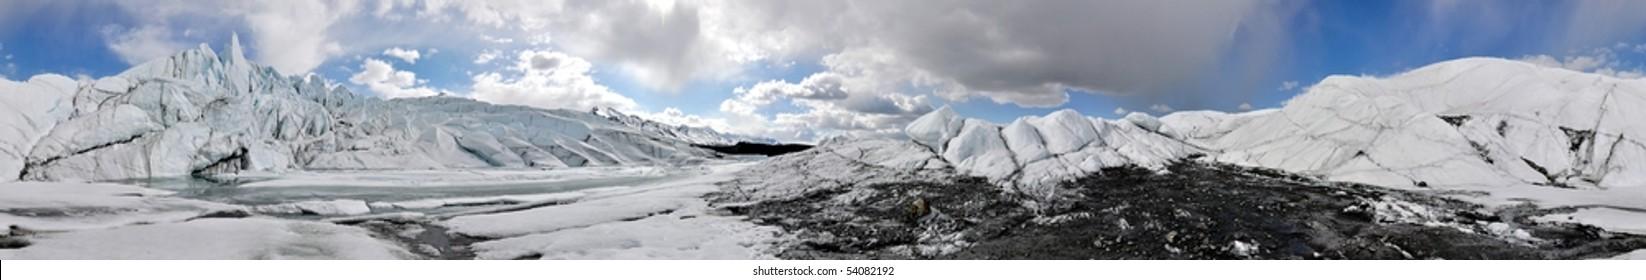 Seamless 360 deg. Panorama of a glacier in Alaska